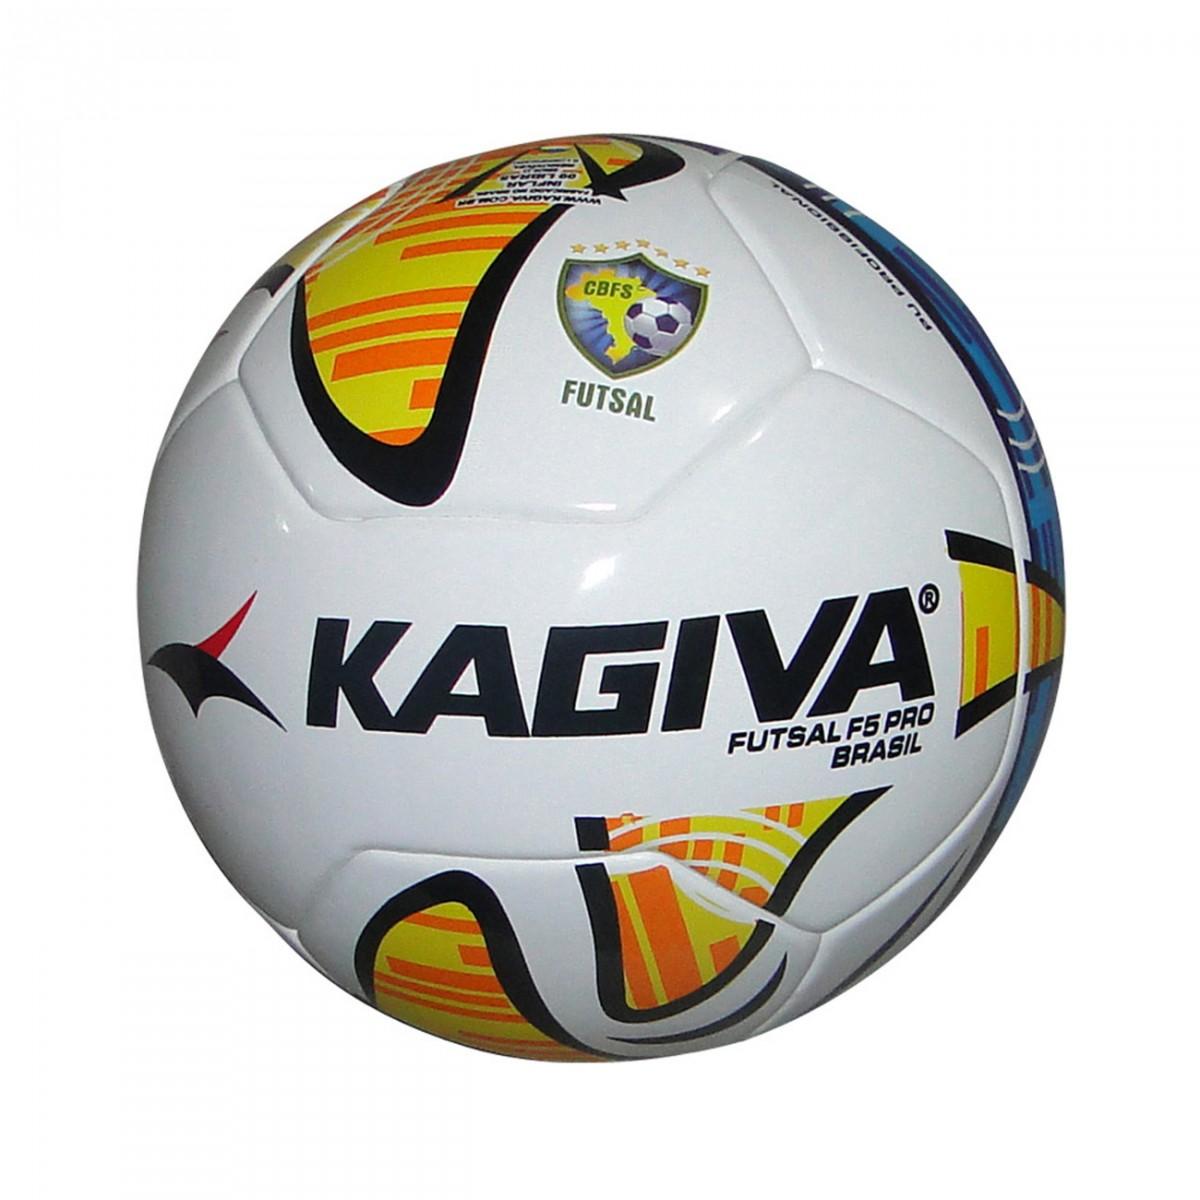 b7a68f0a2d Bola Kagiva F5 Pro 8504-0 - Branco Azul Amarelo - Chuteira Nike ...